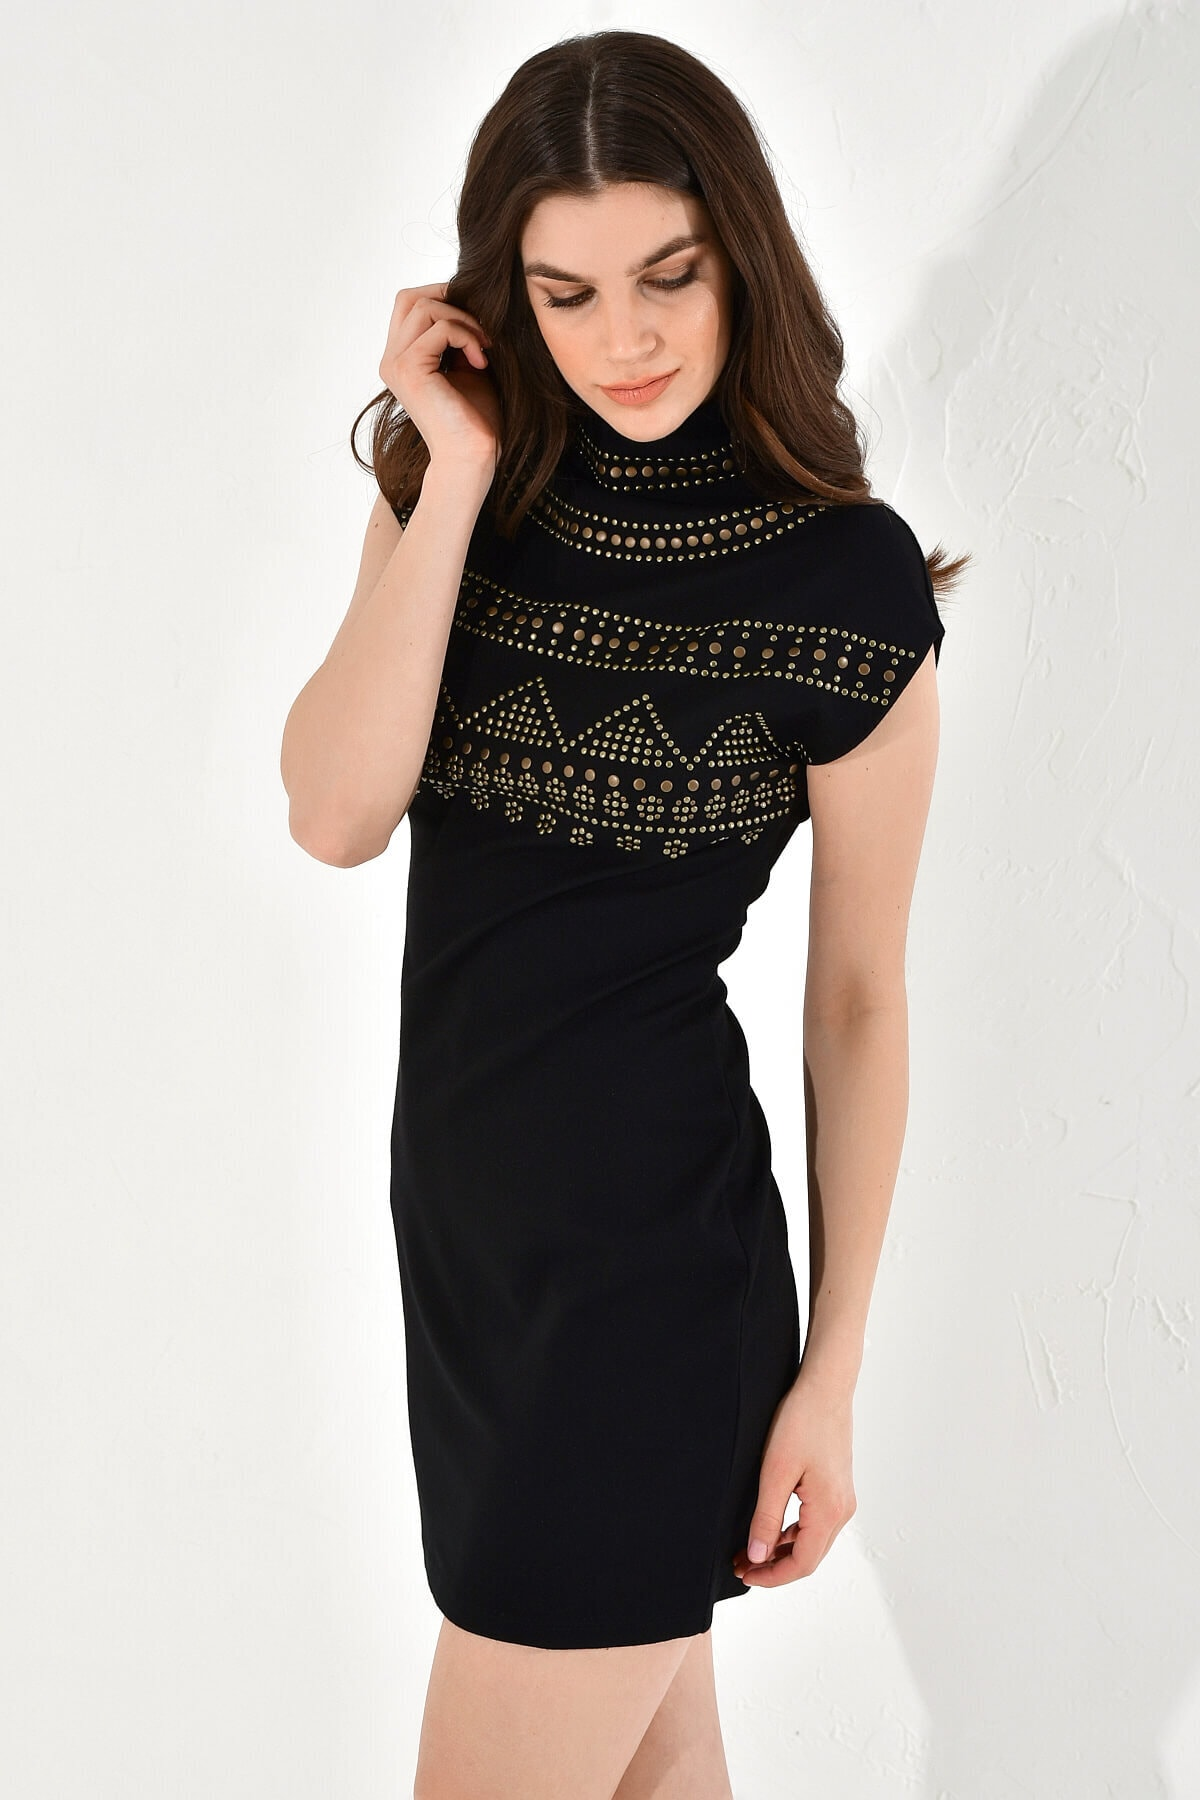 Hanna's by Hanna Darsa Kadın Taş Çakmalı Kolsuz Örme Elbise 2